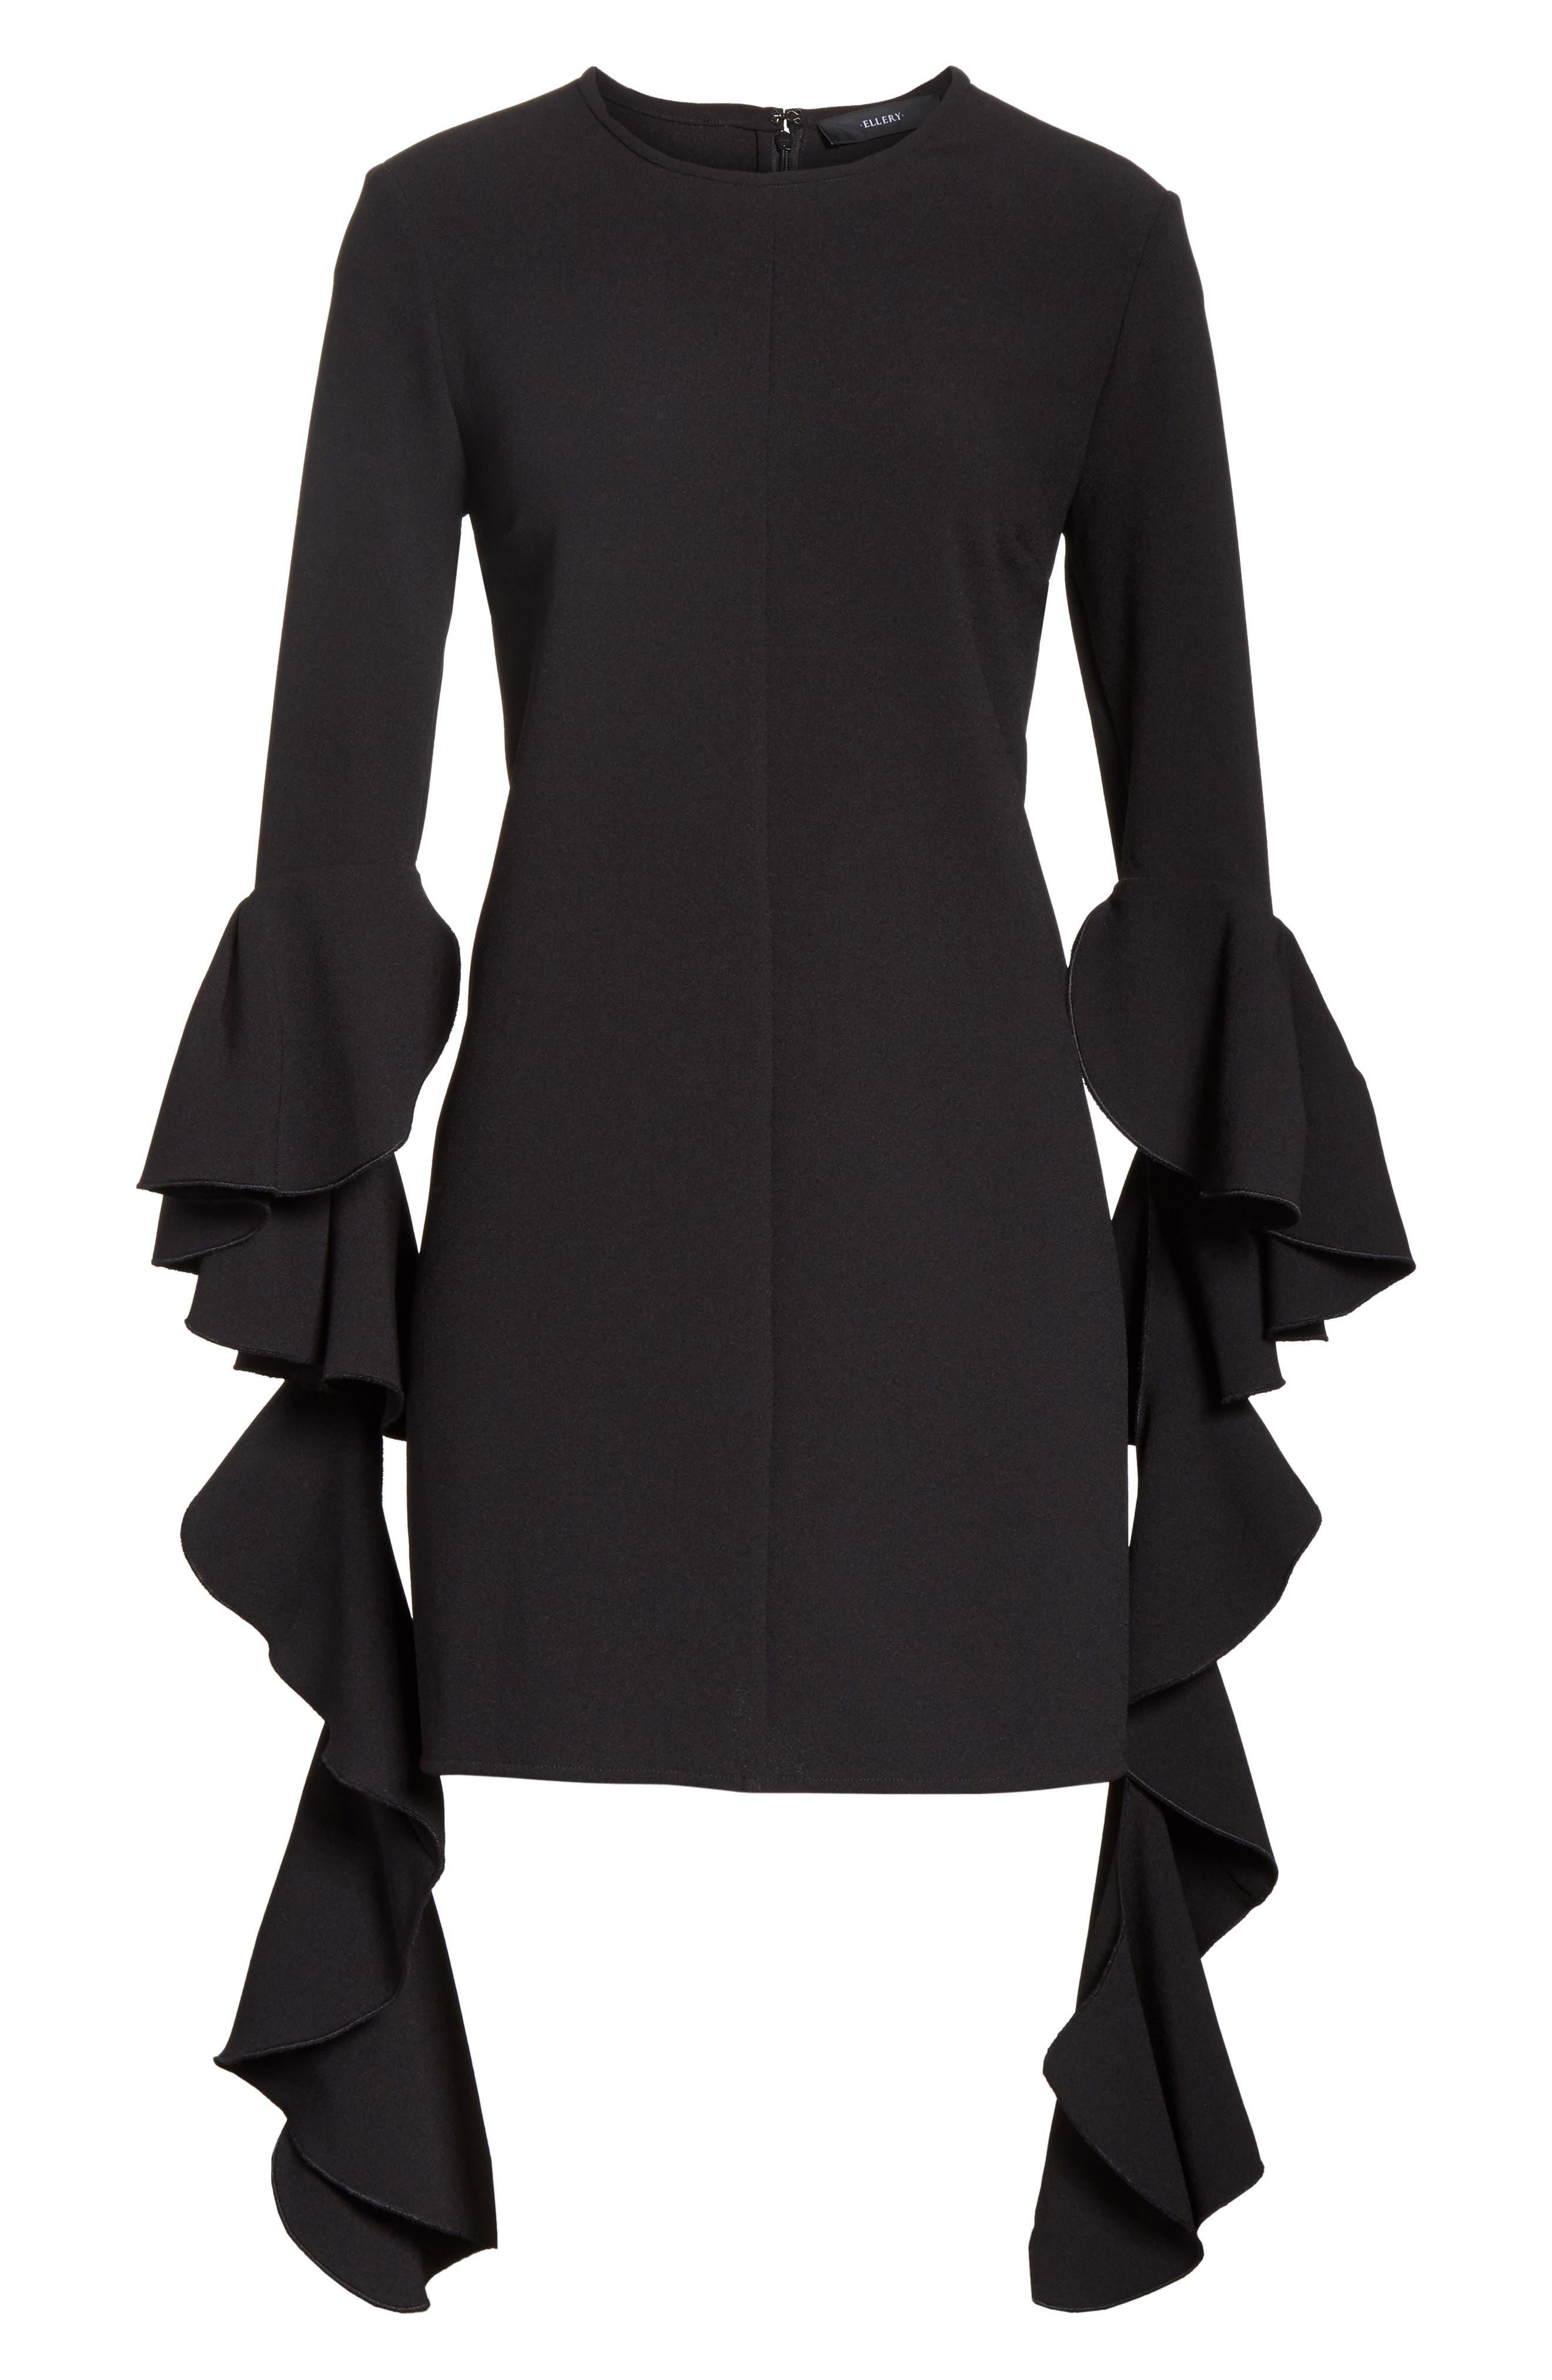 Kilkenny Frill Sleeve Minidress,                             Alternate thumbnail 7, color,                             Black